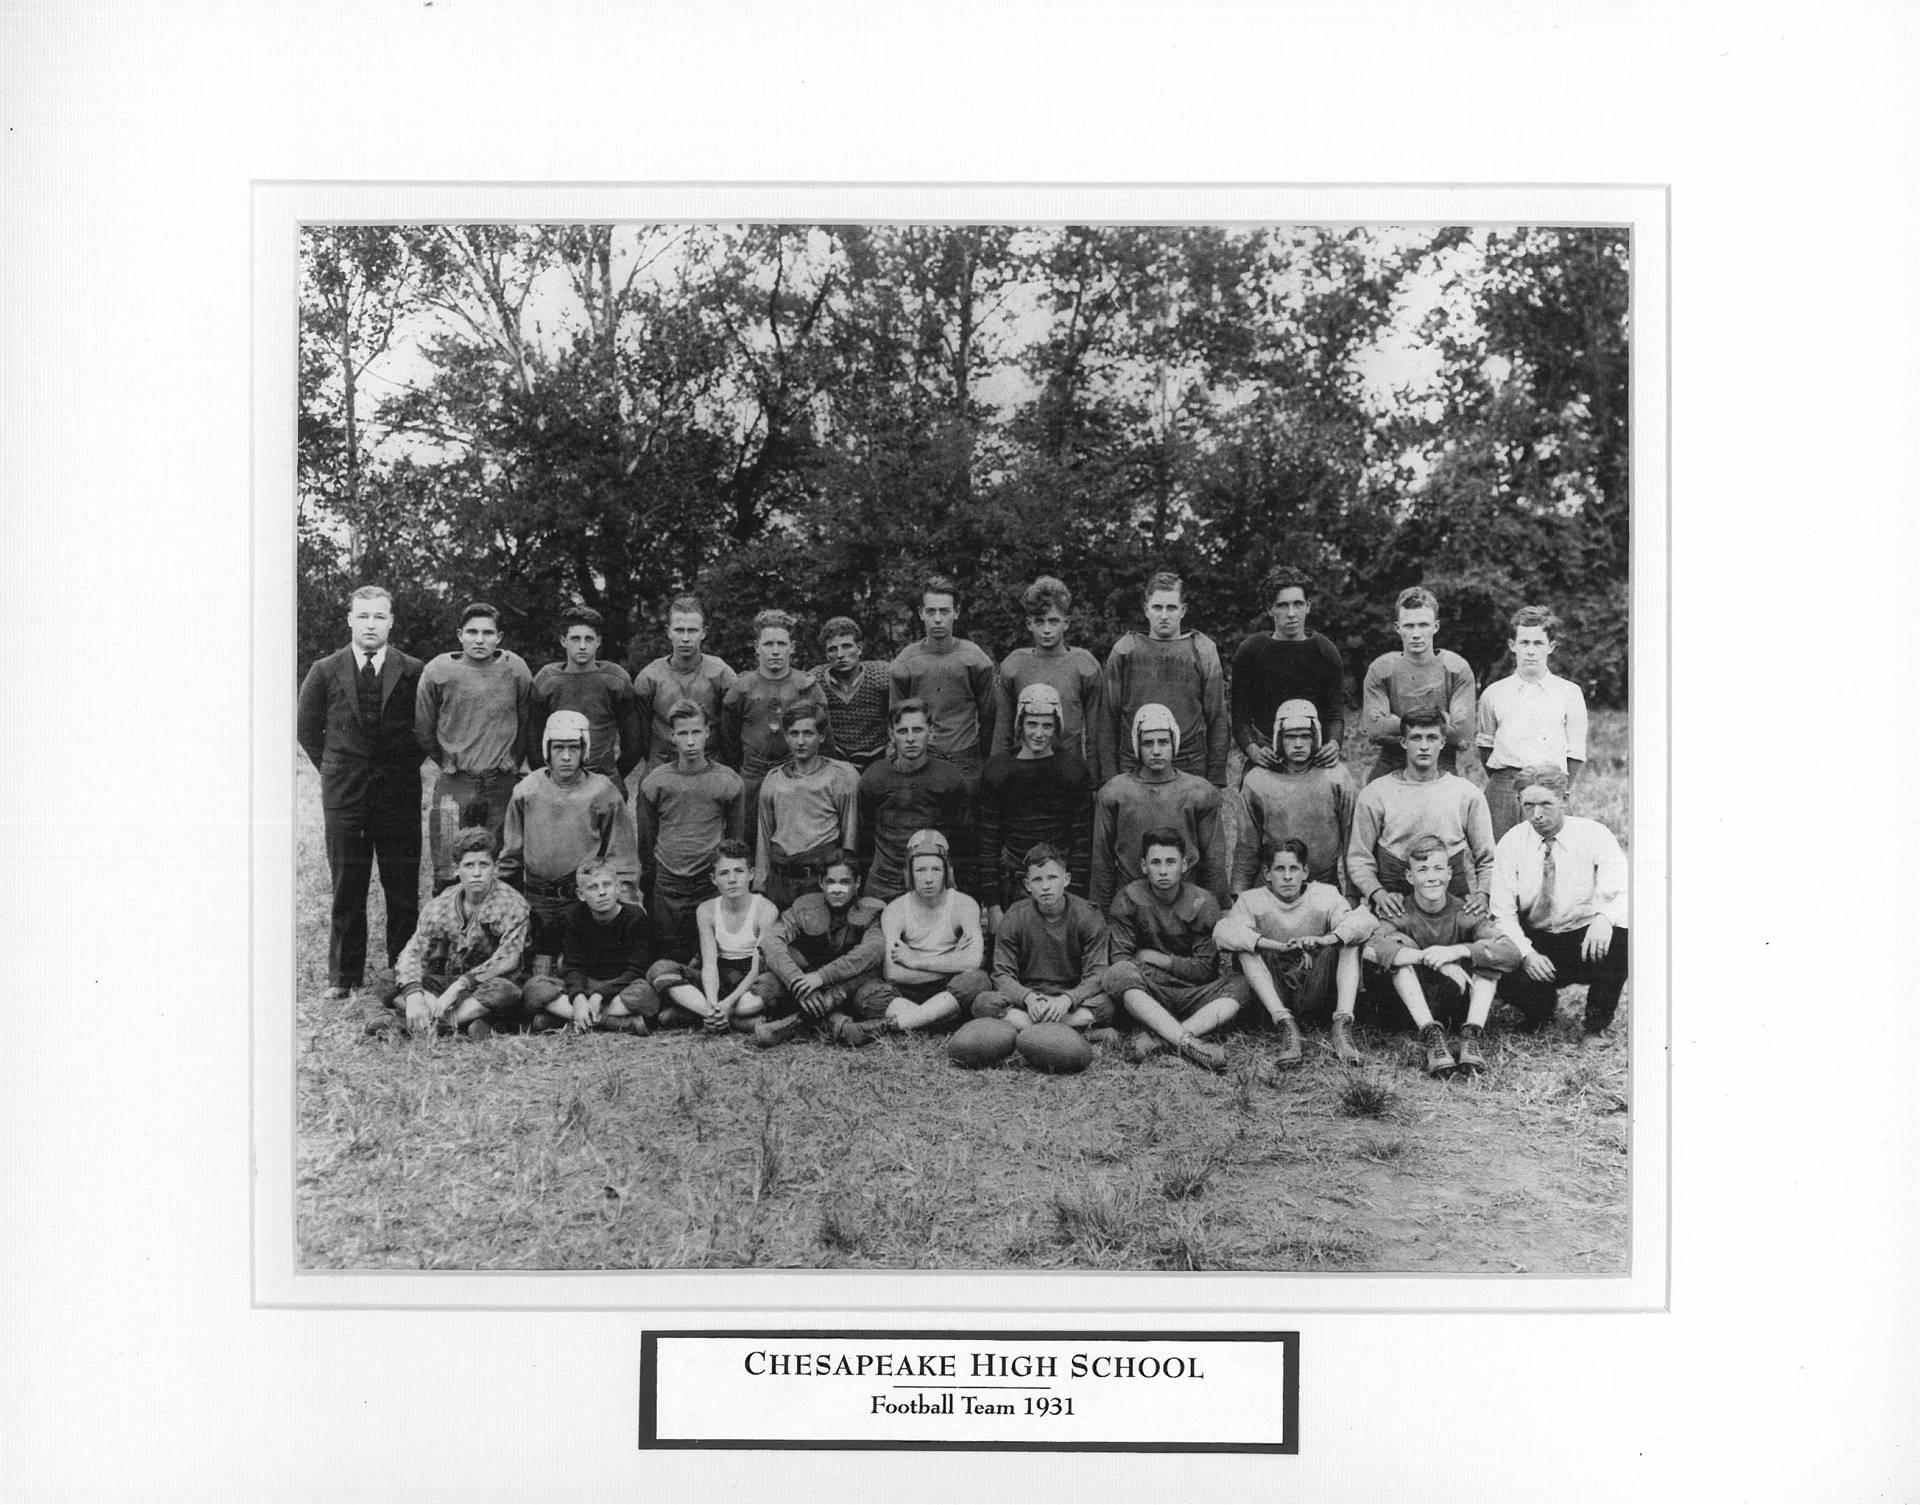 Chesapeake High School Football Team 1931